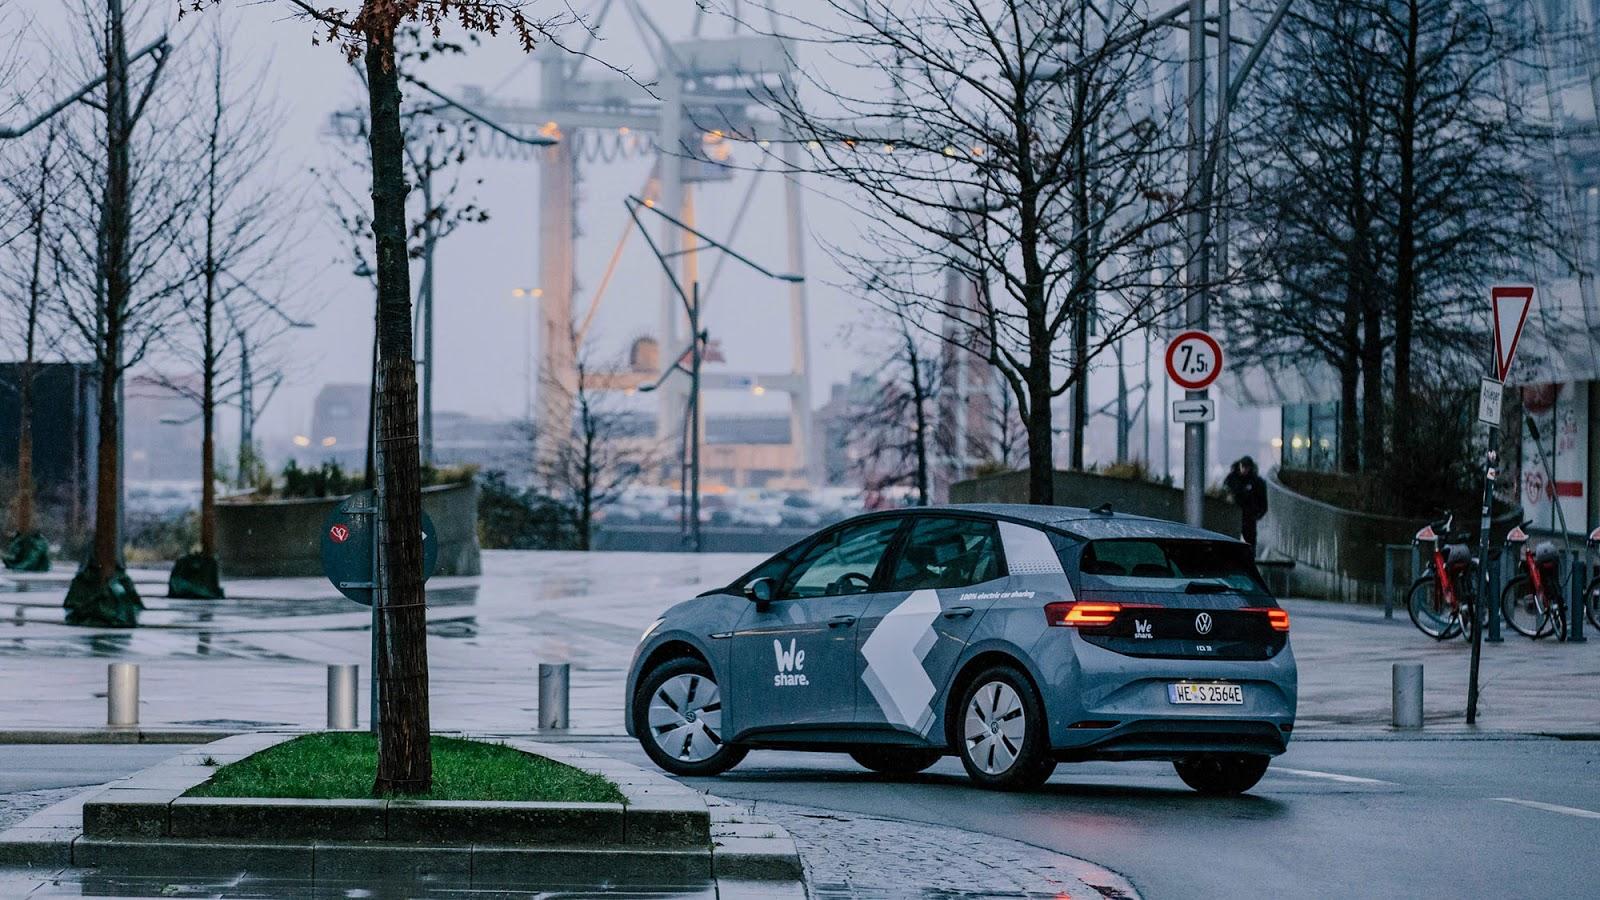 VOLKSWAGEN WESHARE HAMBURG 2 Volkswagen : Ξεκινά car sharing ηλεκτρικών αυτοκινήτων στο Αμβούργο car sharing, Electric cars, electric vehicles, ID.3, Volkswagen, Volkswagen ID.3, VW ID.3, ειδήσεις, ηλεκτρικά, ηλεκτροκινηση